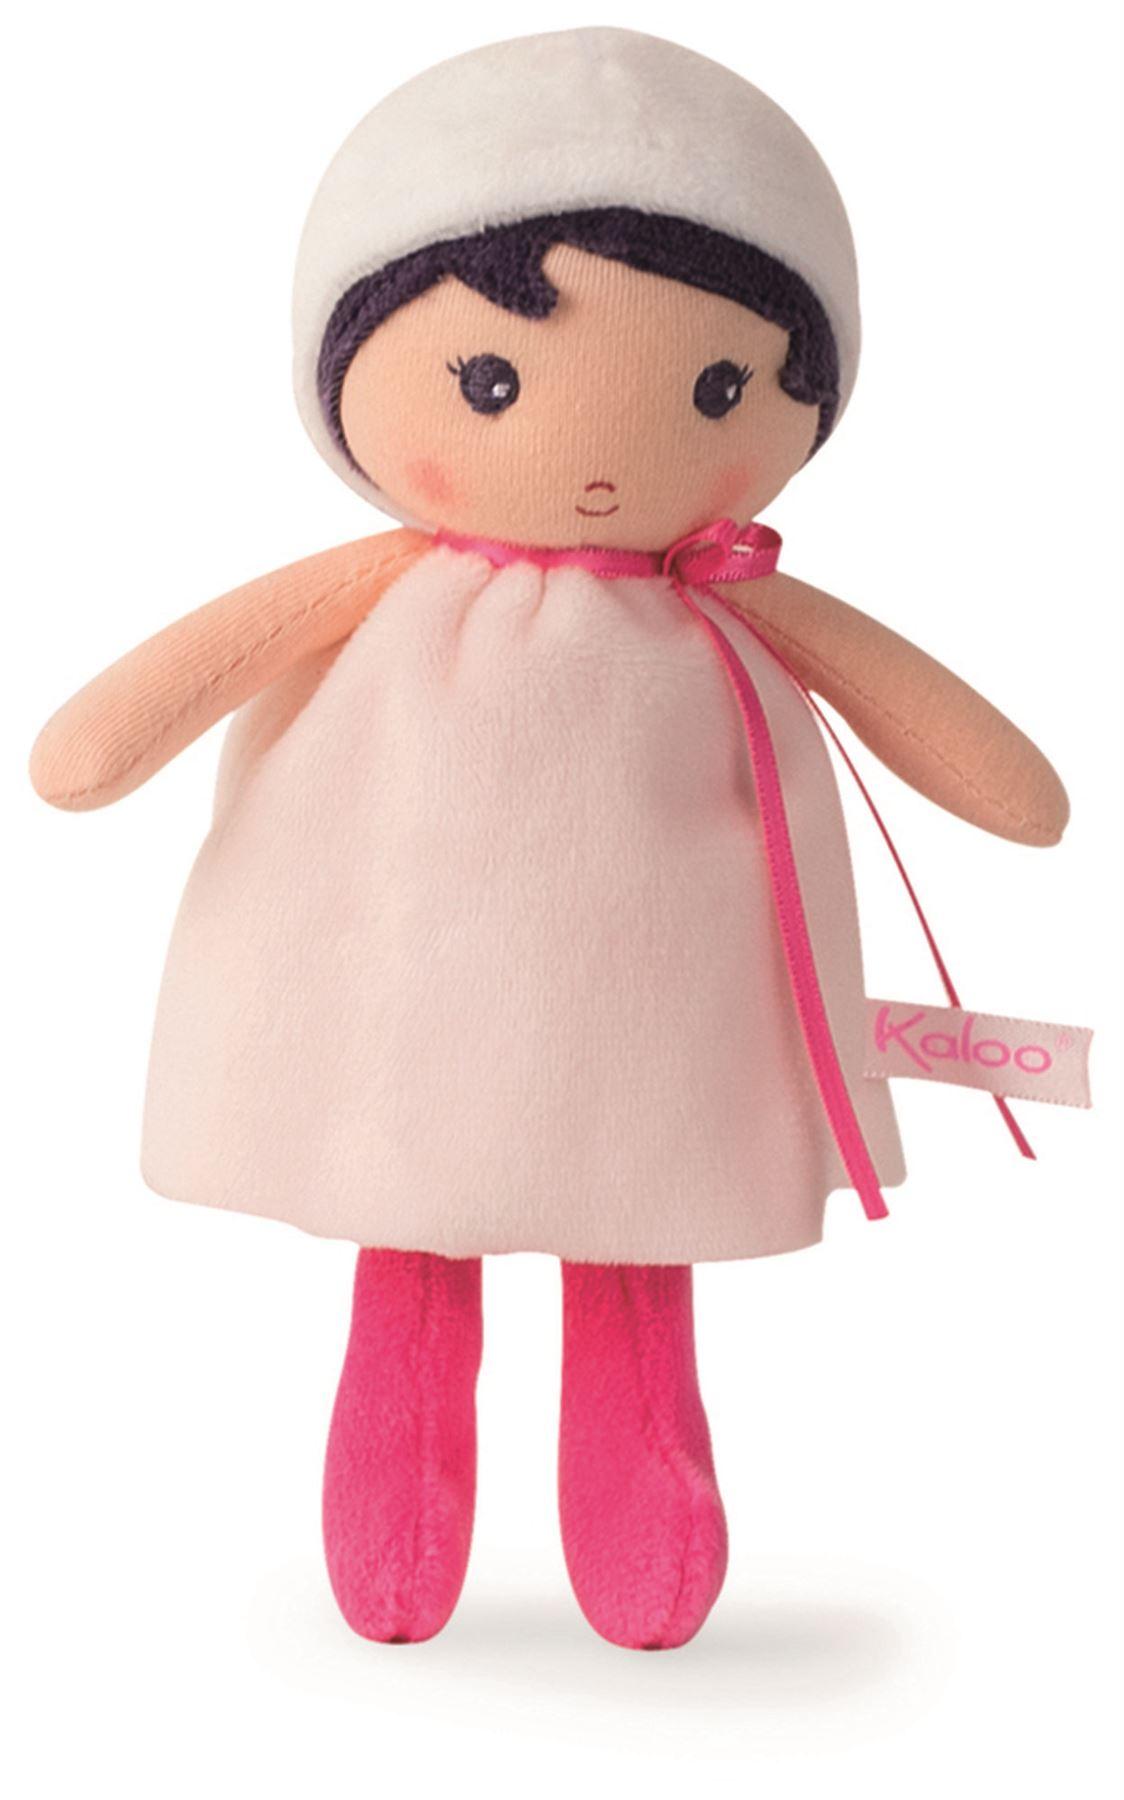 KALOO Emma K poupée-PETITE BABY SOFT TOYS activités Cadeau BN